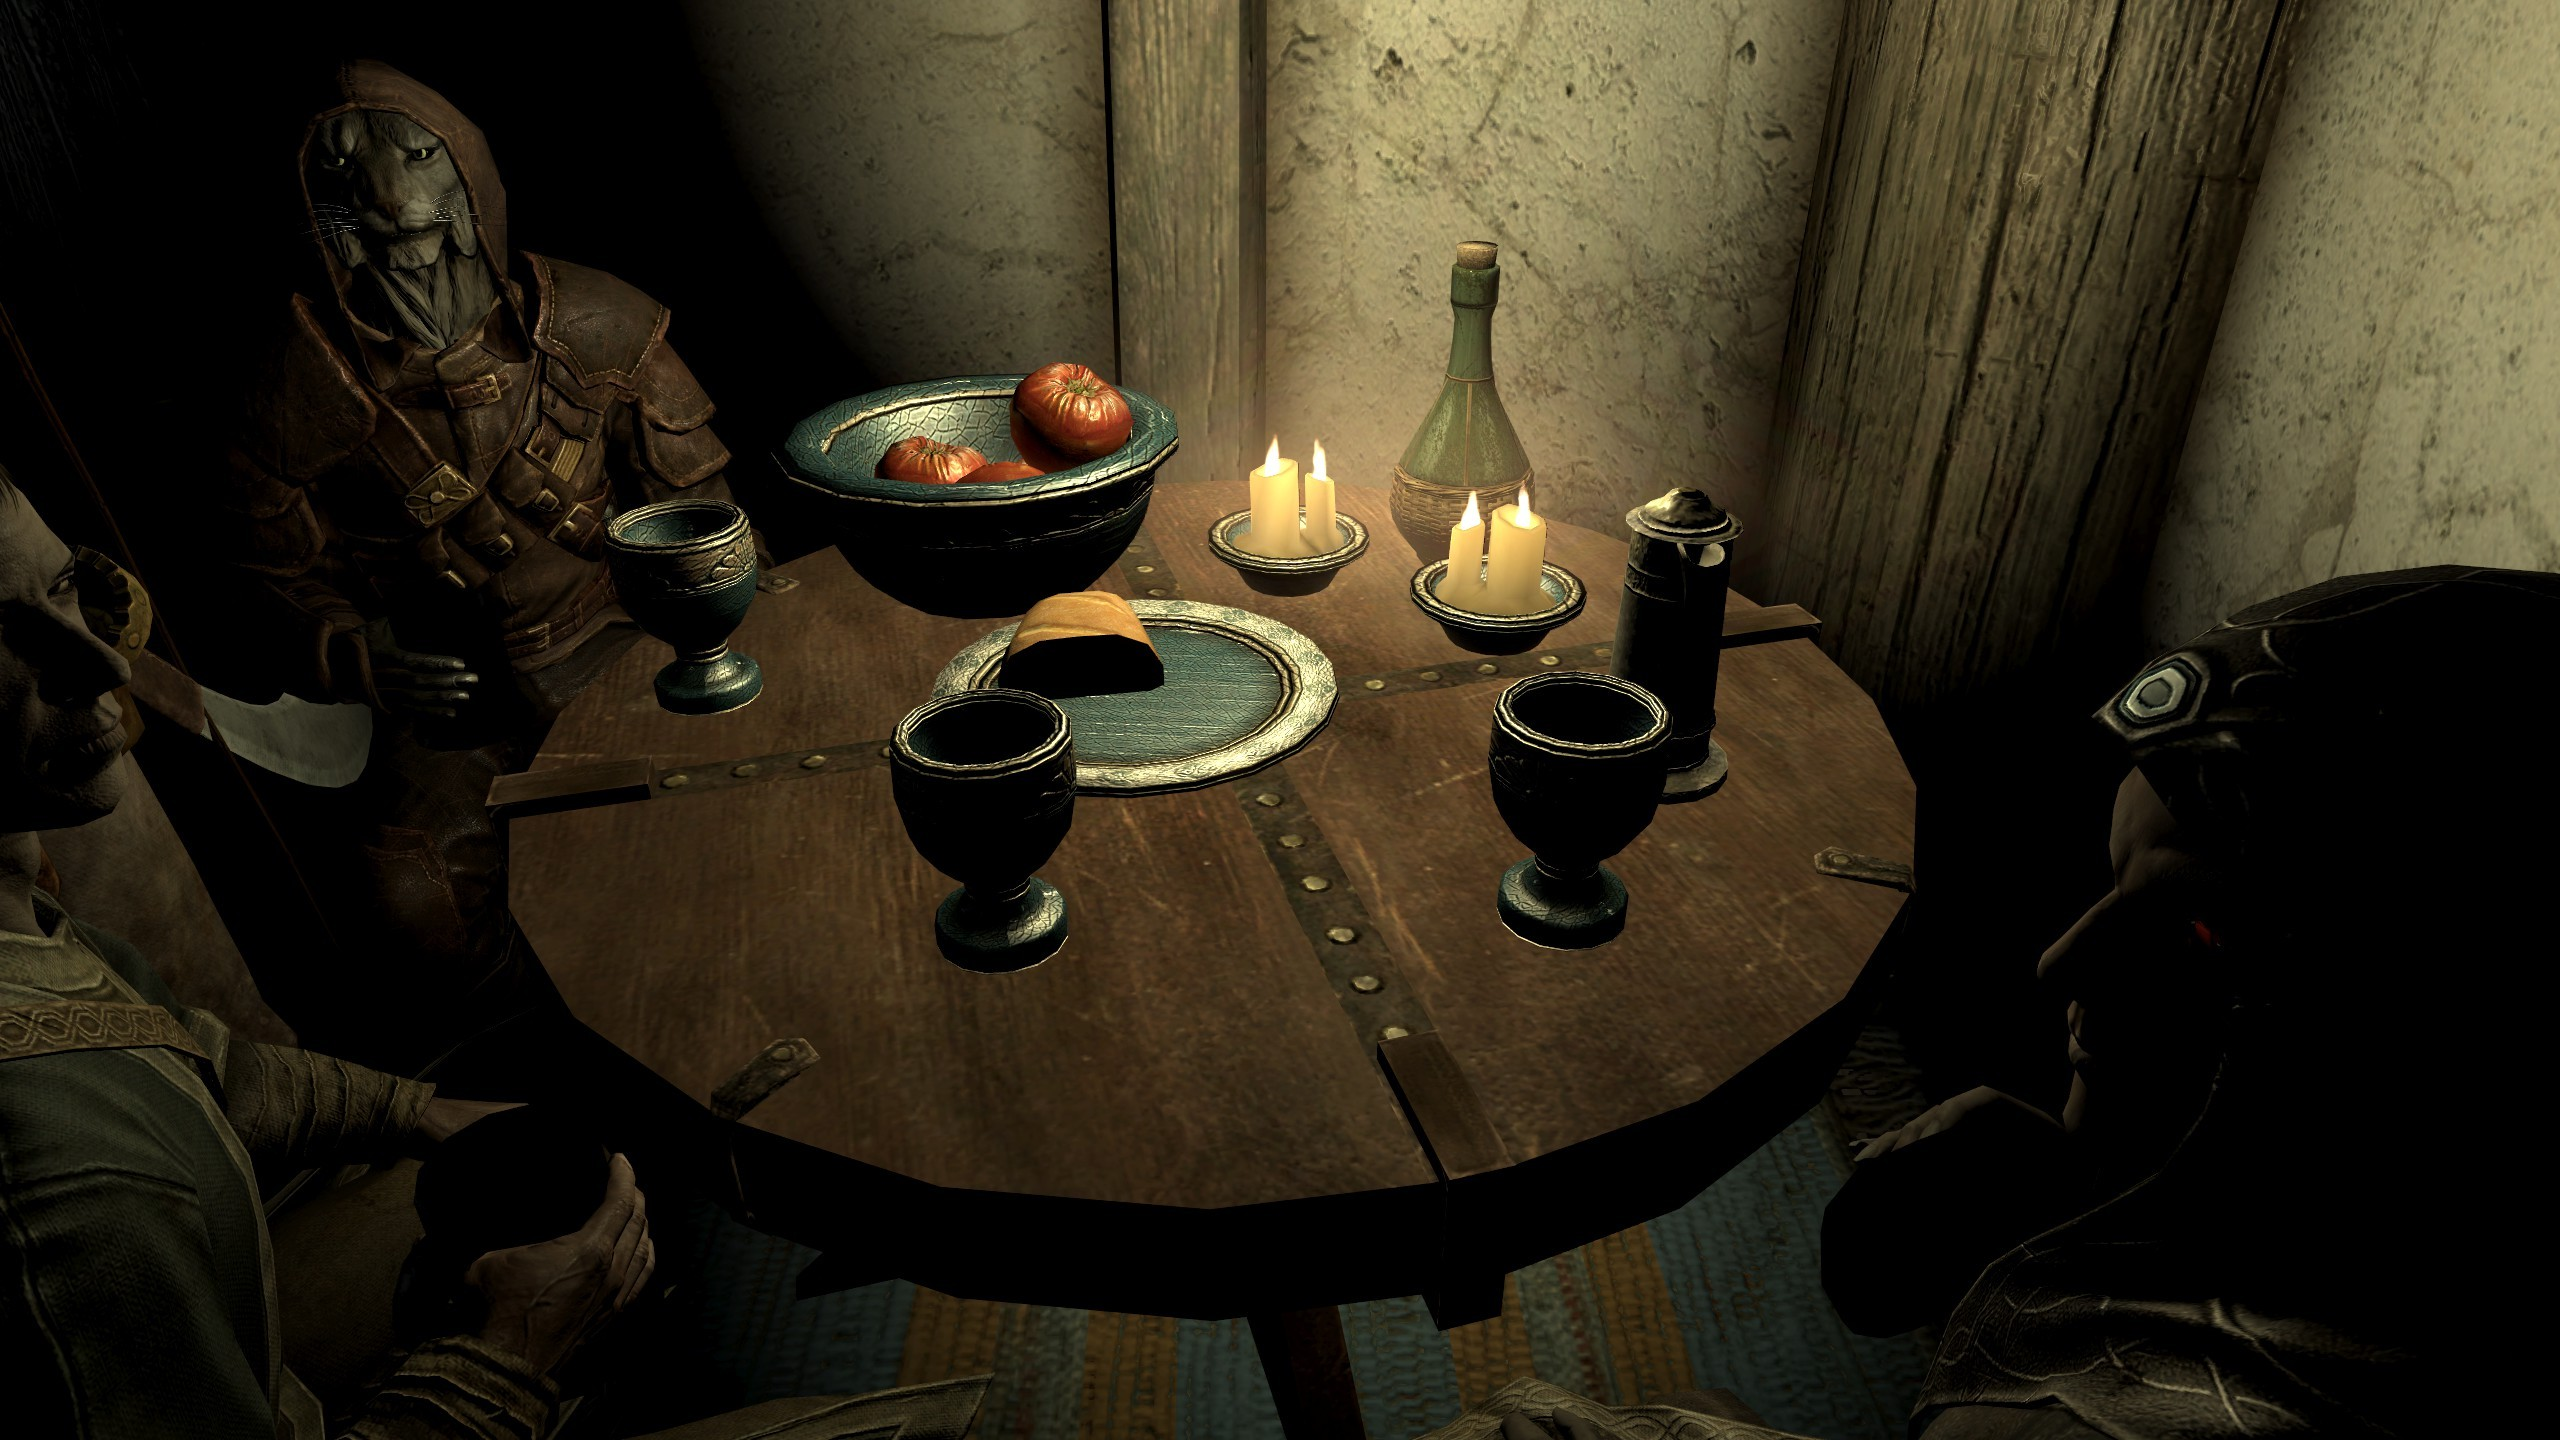 The Elder Scrolls V Skyrim Video Games Cozy Wallpaper - Cozy Video Games , HD Wallpaper & Backgrounds